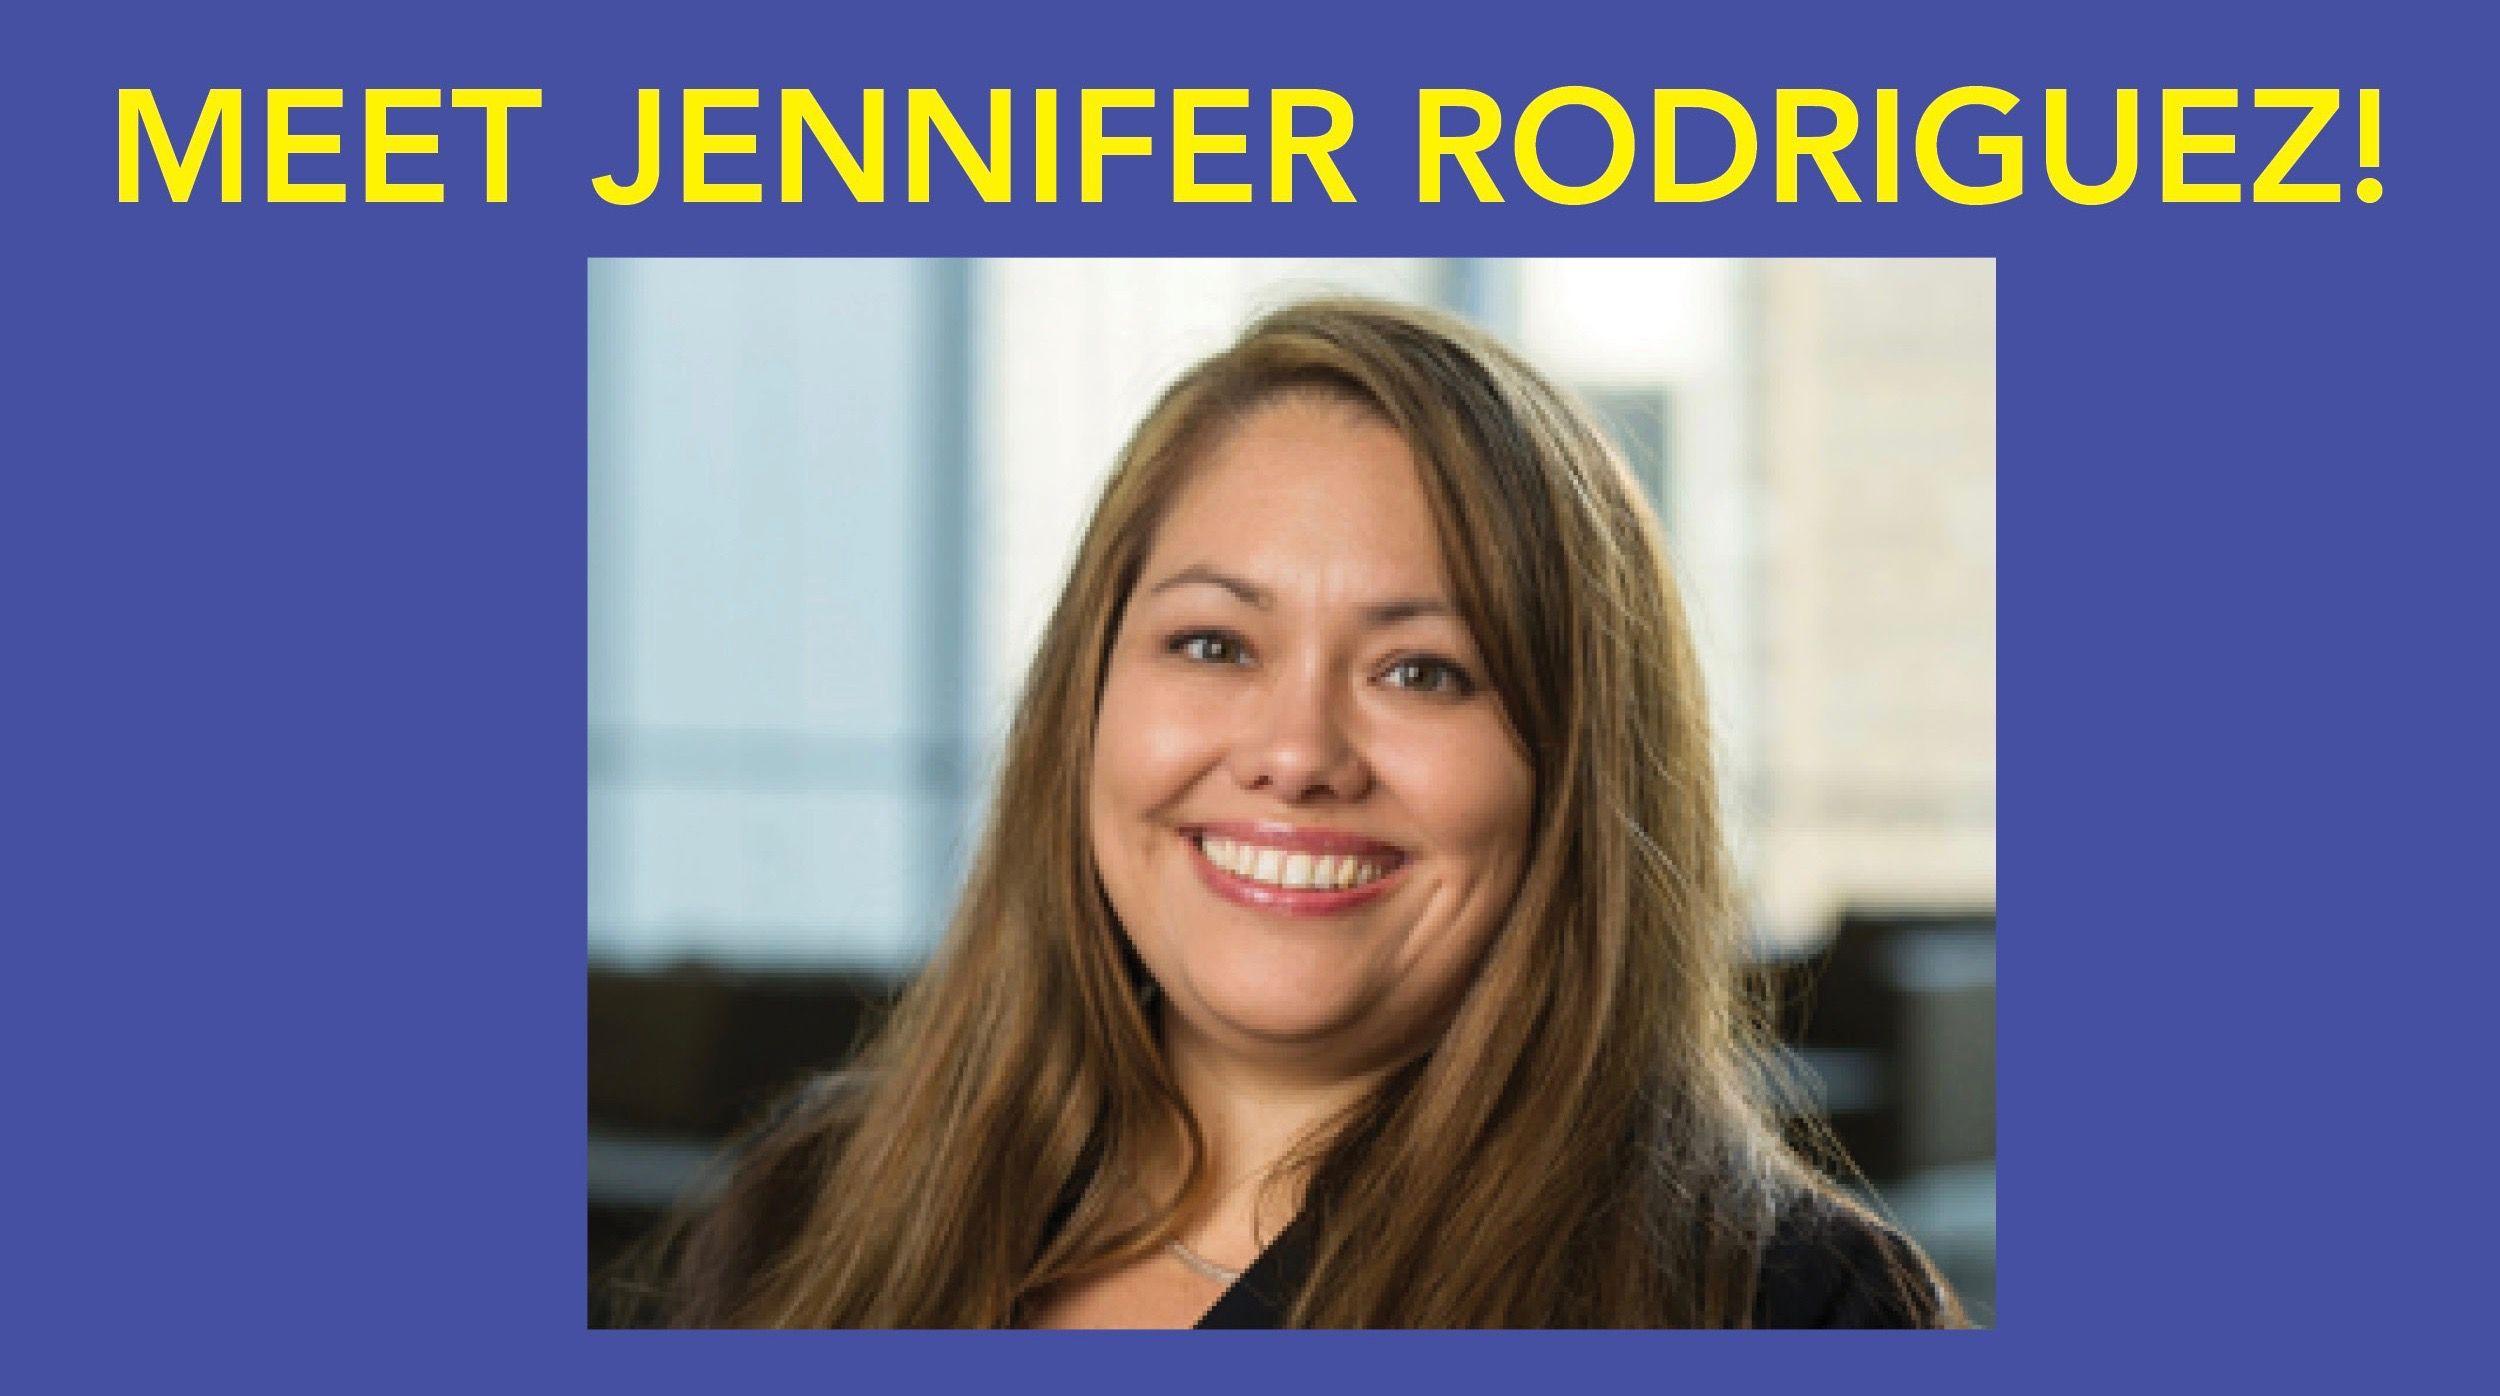 Meet Jennifer Rodriguez